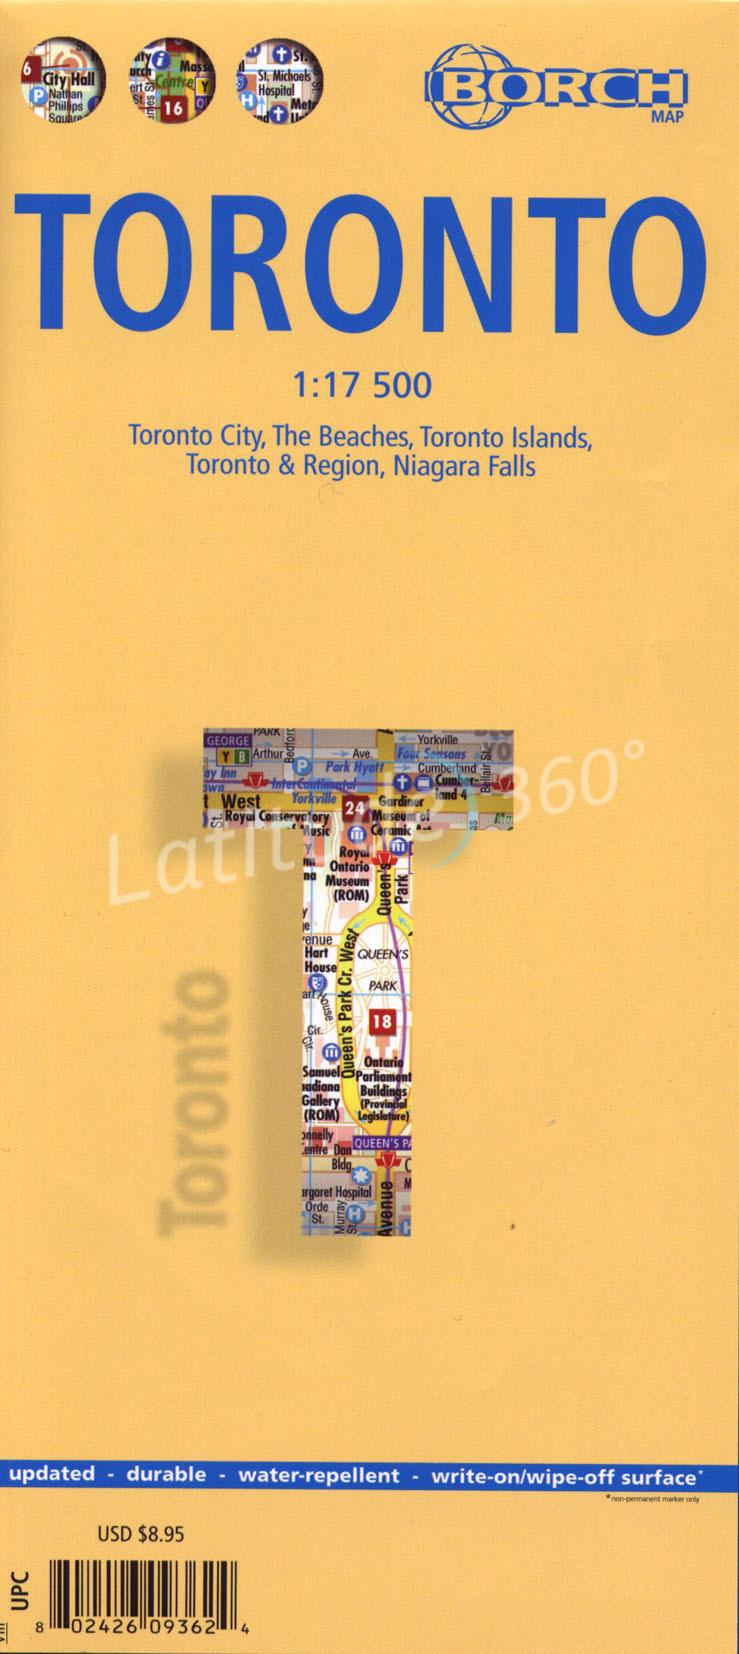 Stadsplattegrond Toronto   Borch Maps